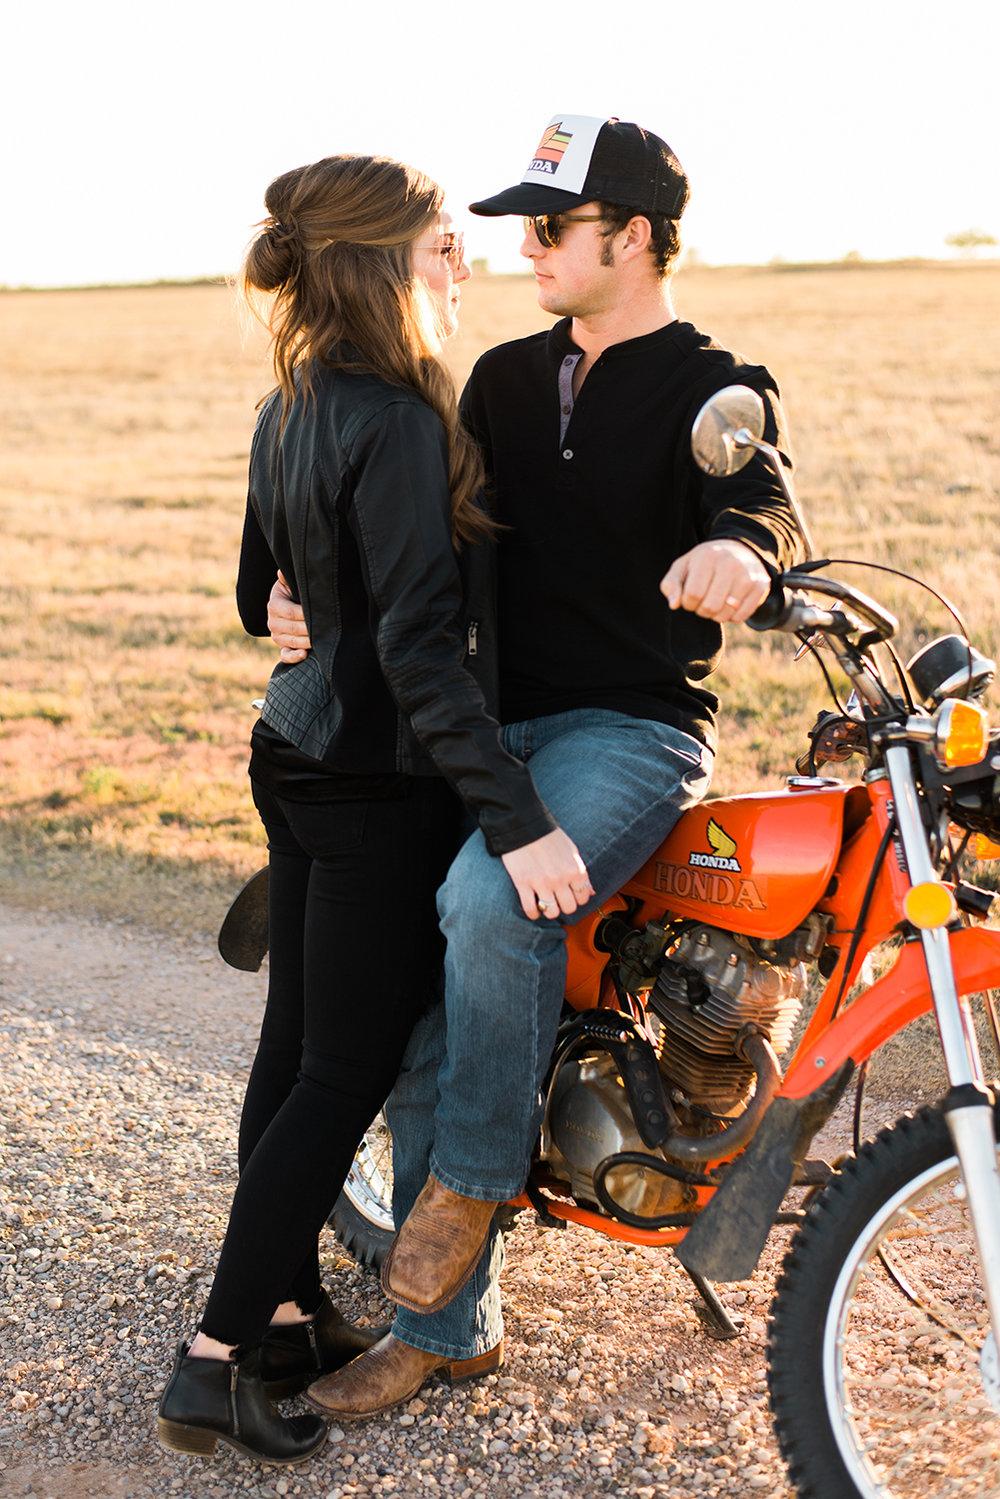 edgy-motorcycle-couple-shoot-denver-photographer-4.jpg